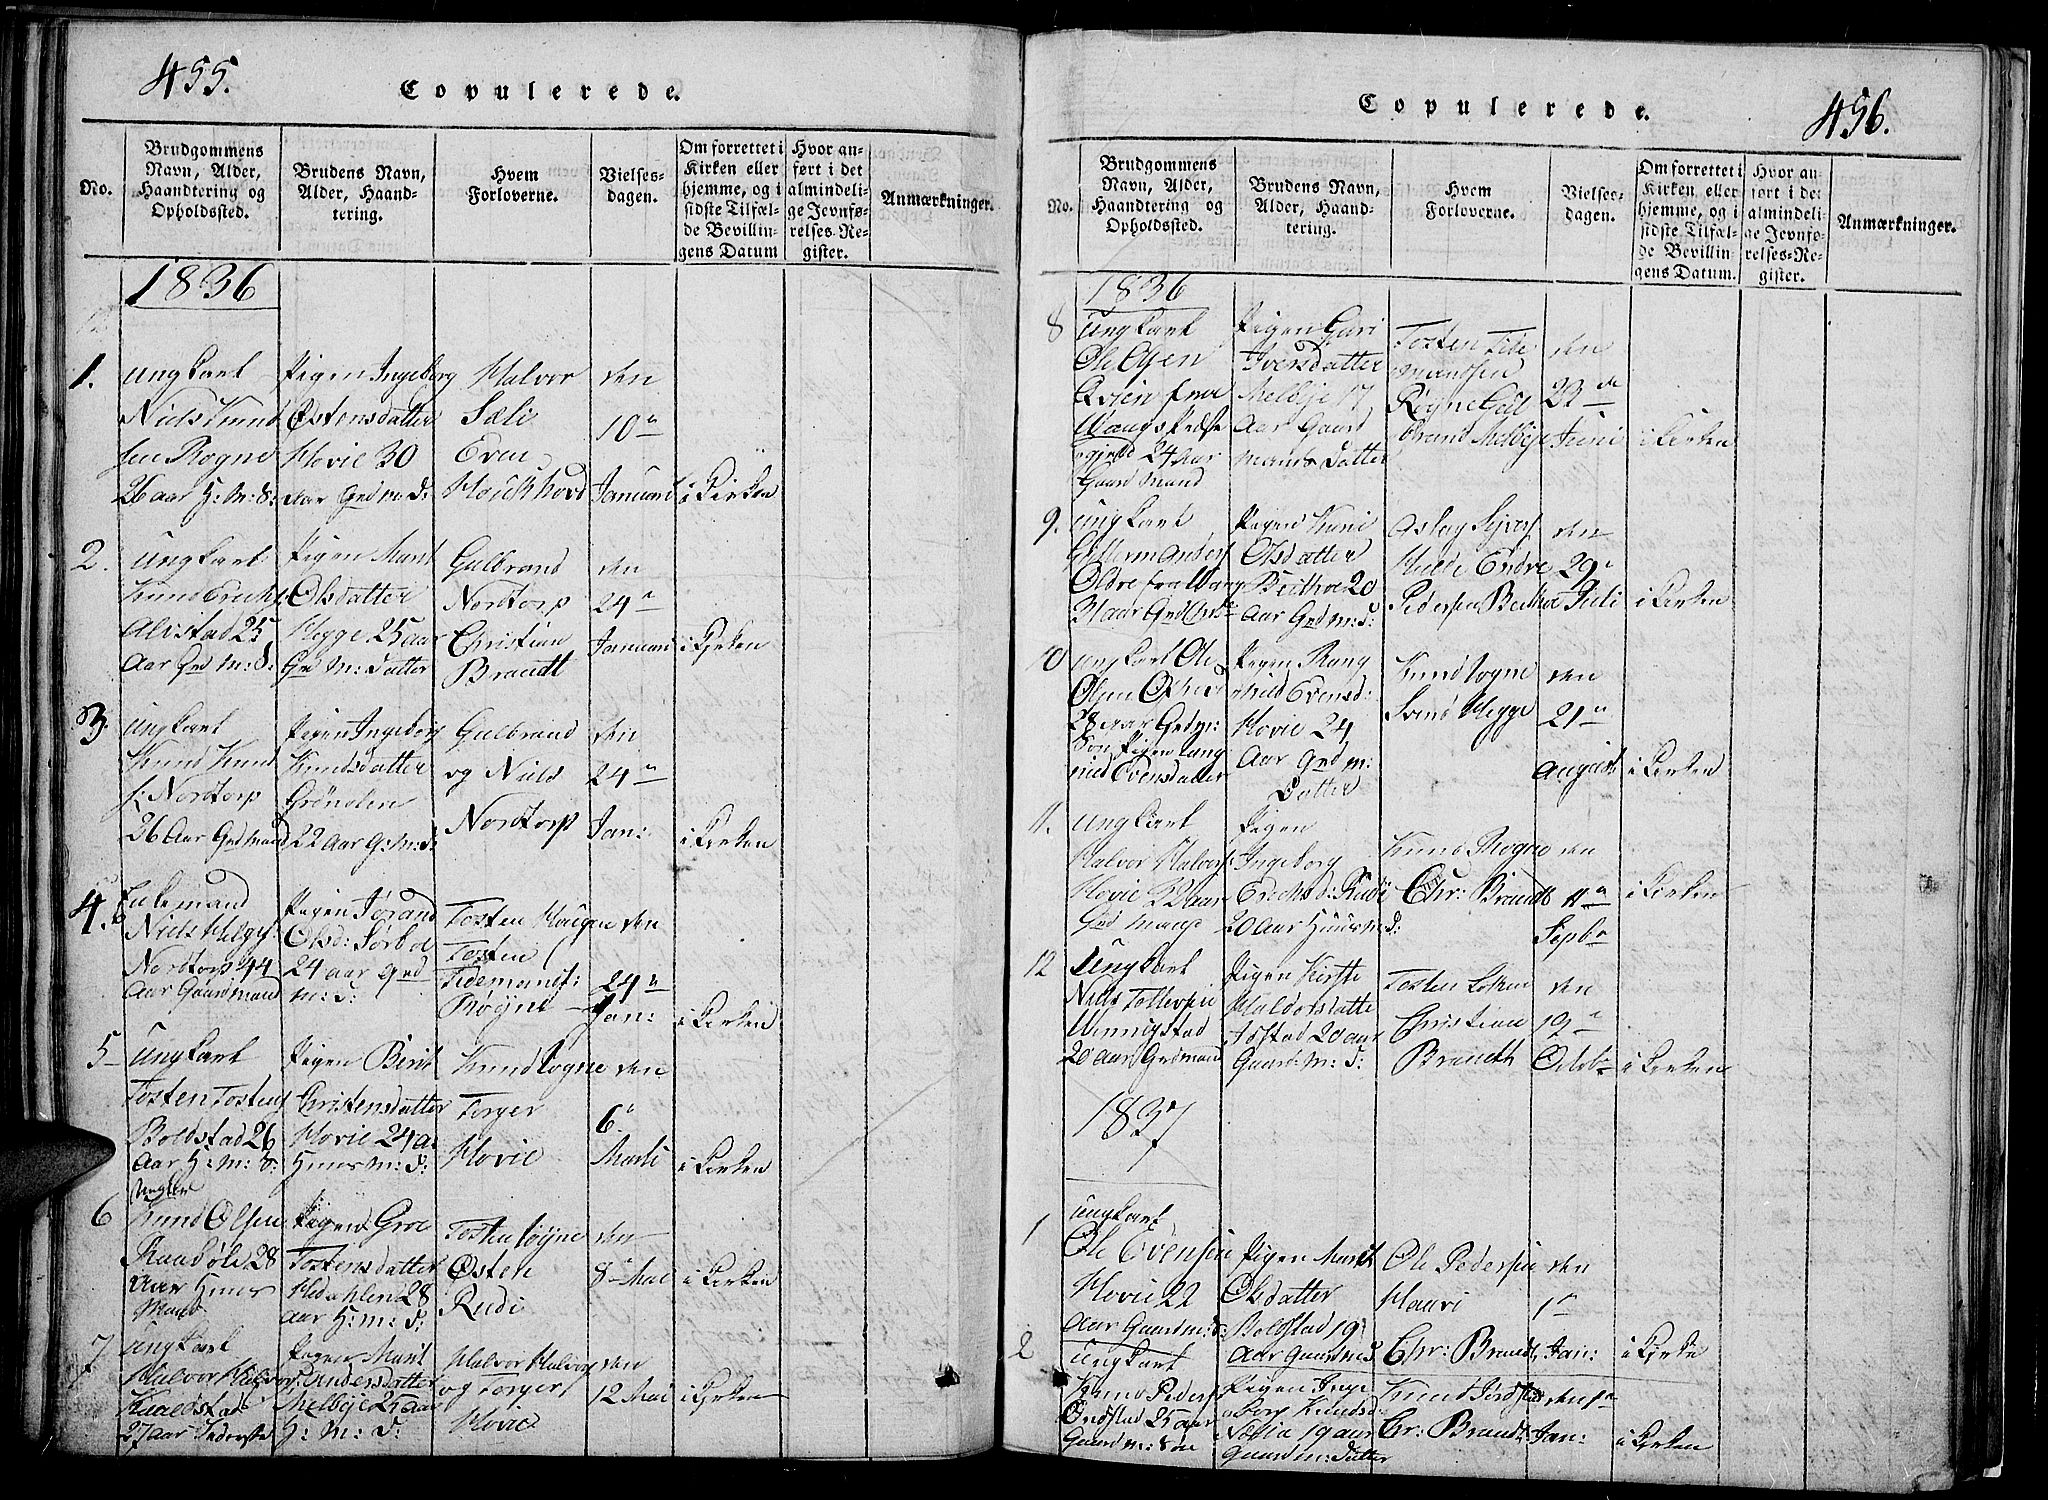 SAH, Slidre prestekontor, Klokkerbok nr. 2, 1814-1839, s. 455-456